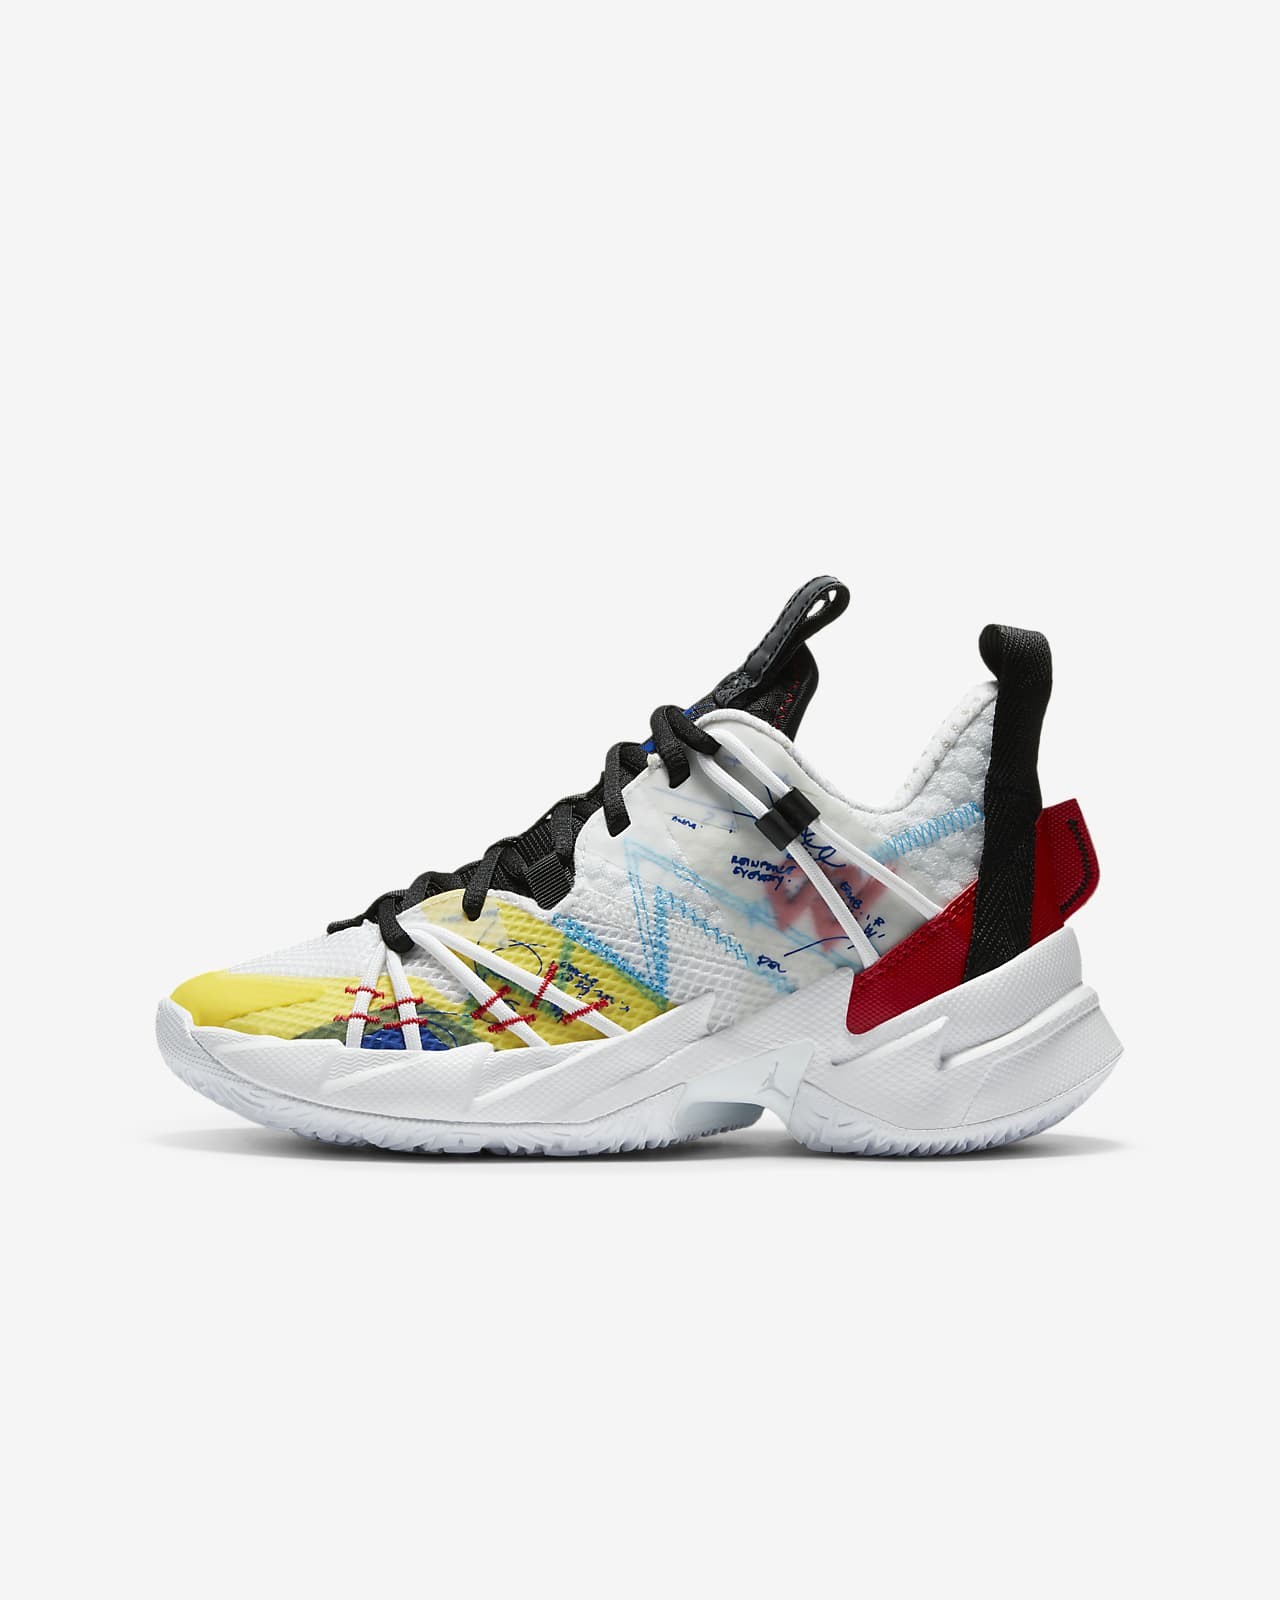 Zer0.3 SE Big Kids' Basketball Shoe